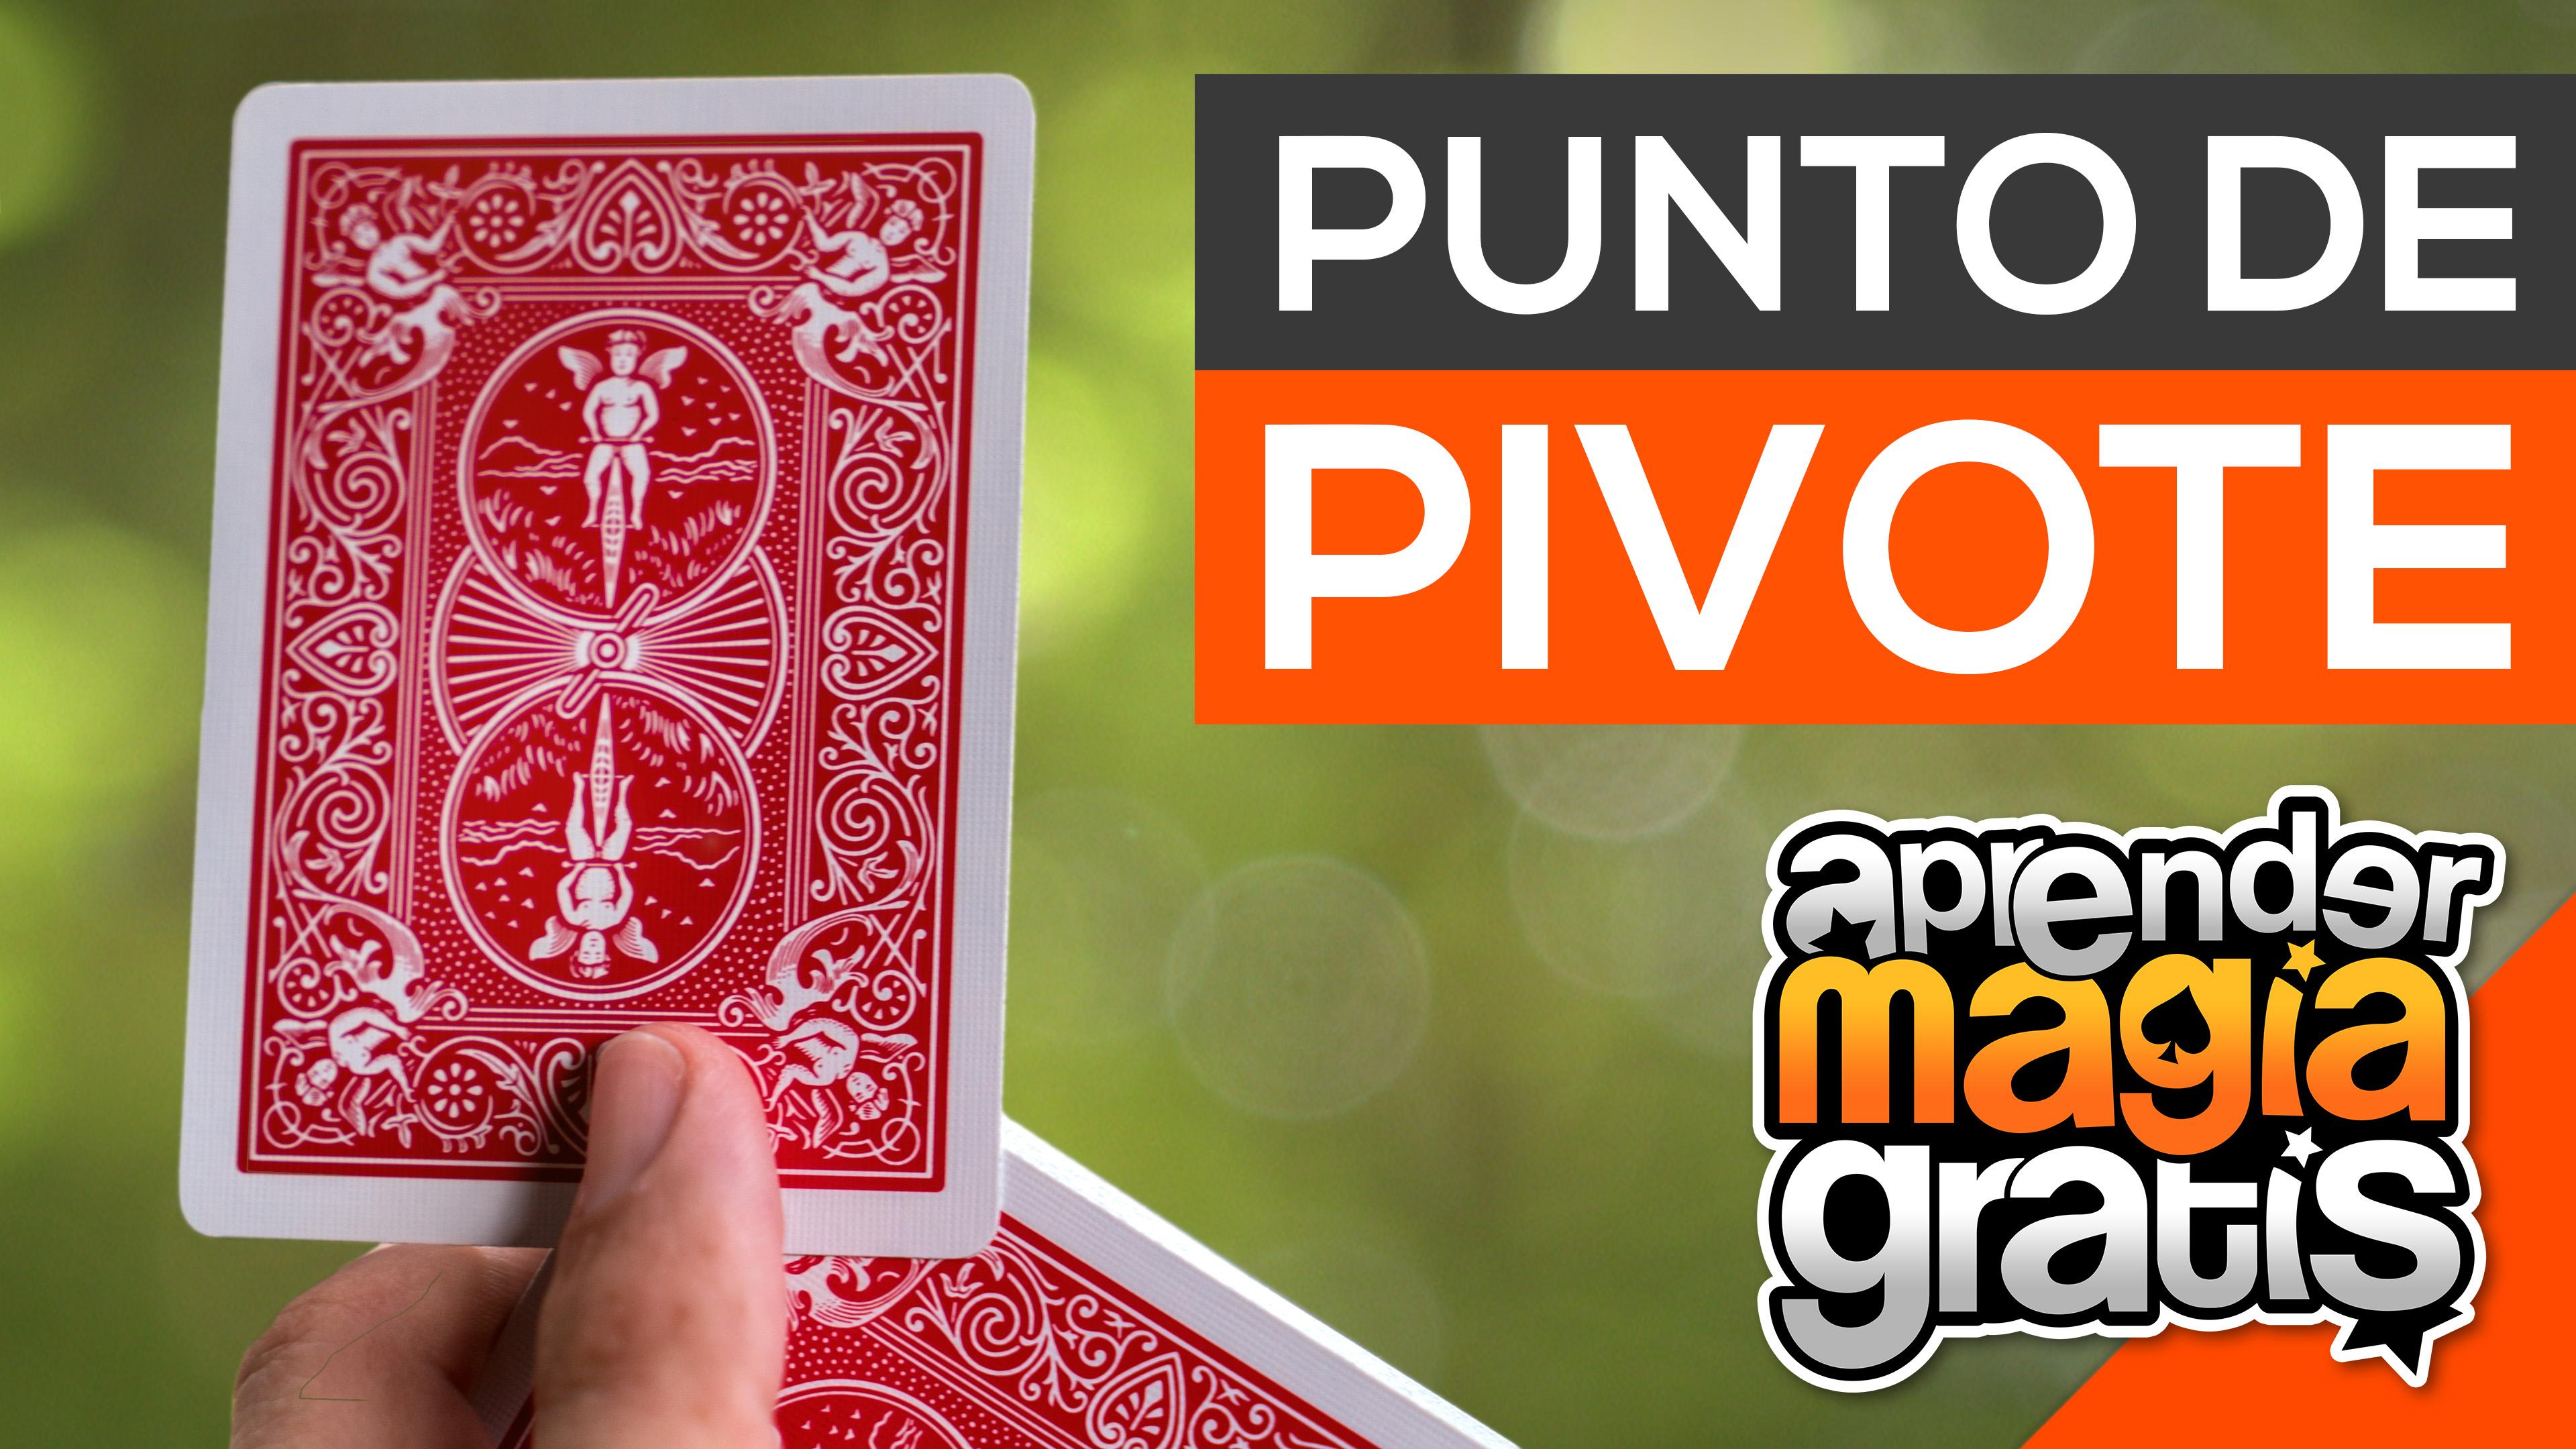 Ejes y pivotes con cartas - Florituras - Aprender Magia Gratis - Agustin Tash